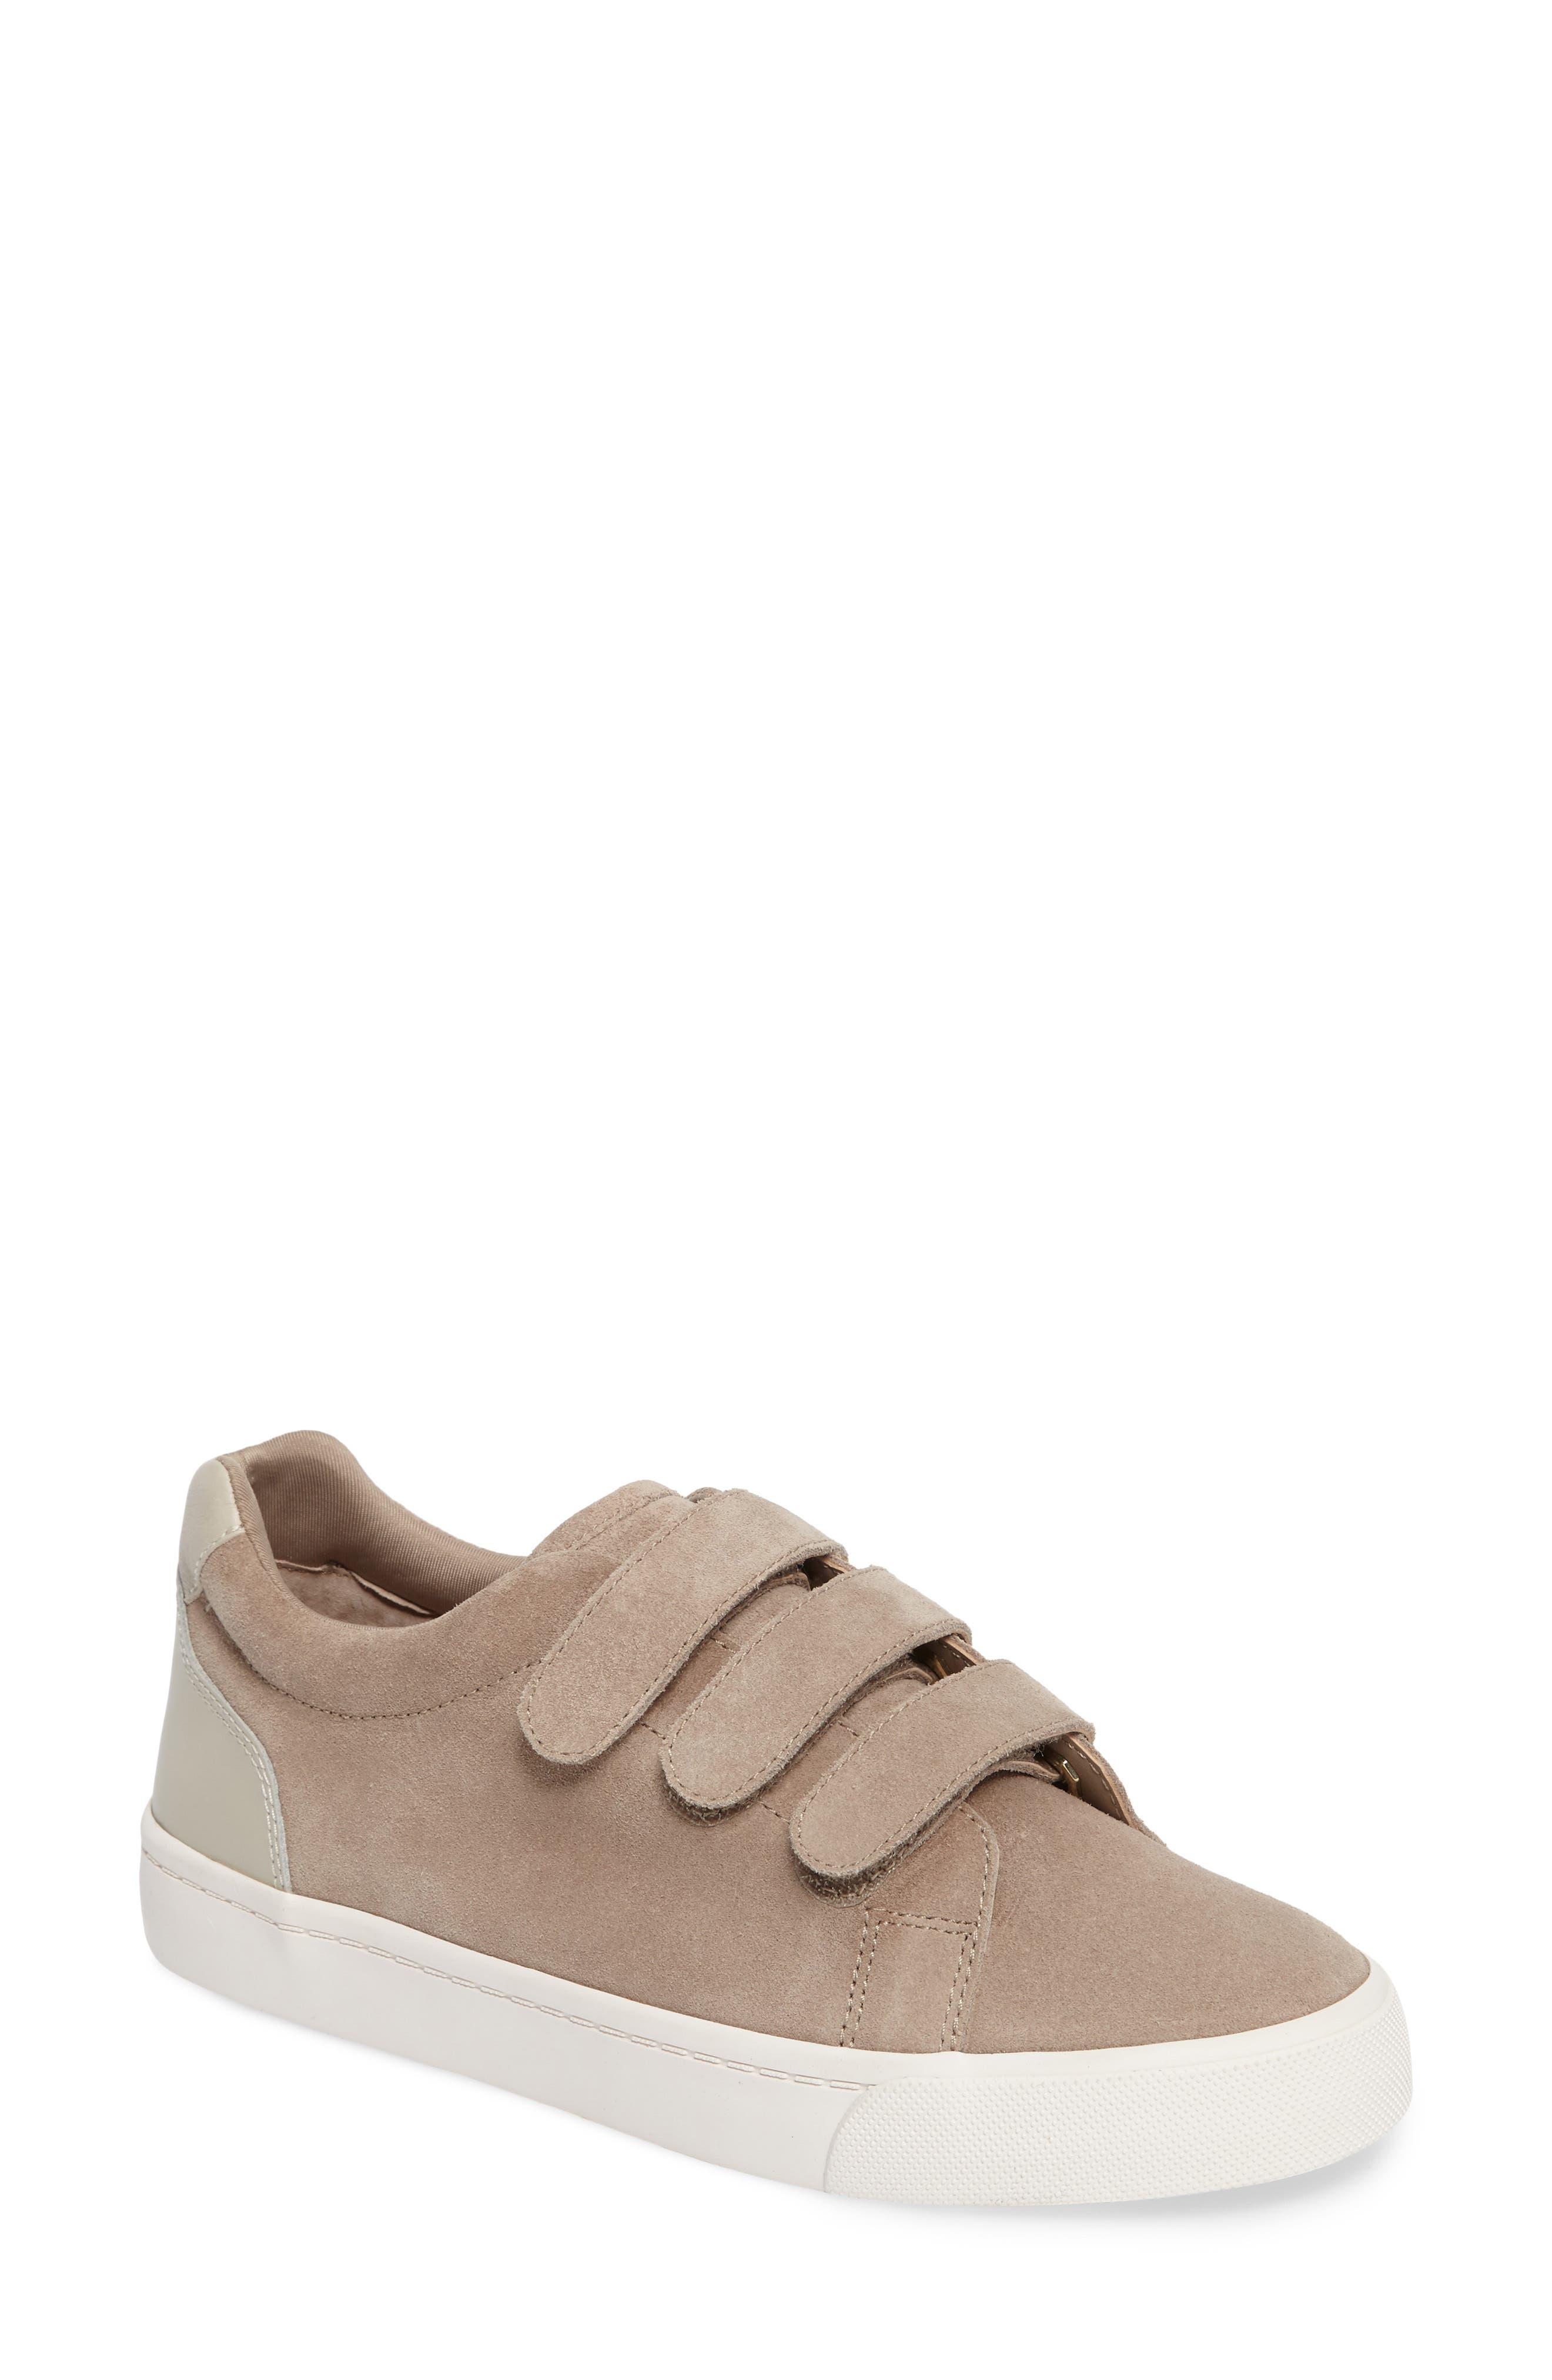 Loiuse et Cie Bacar Platform Sneaker (Women)